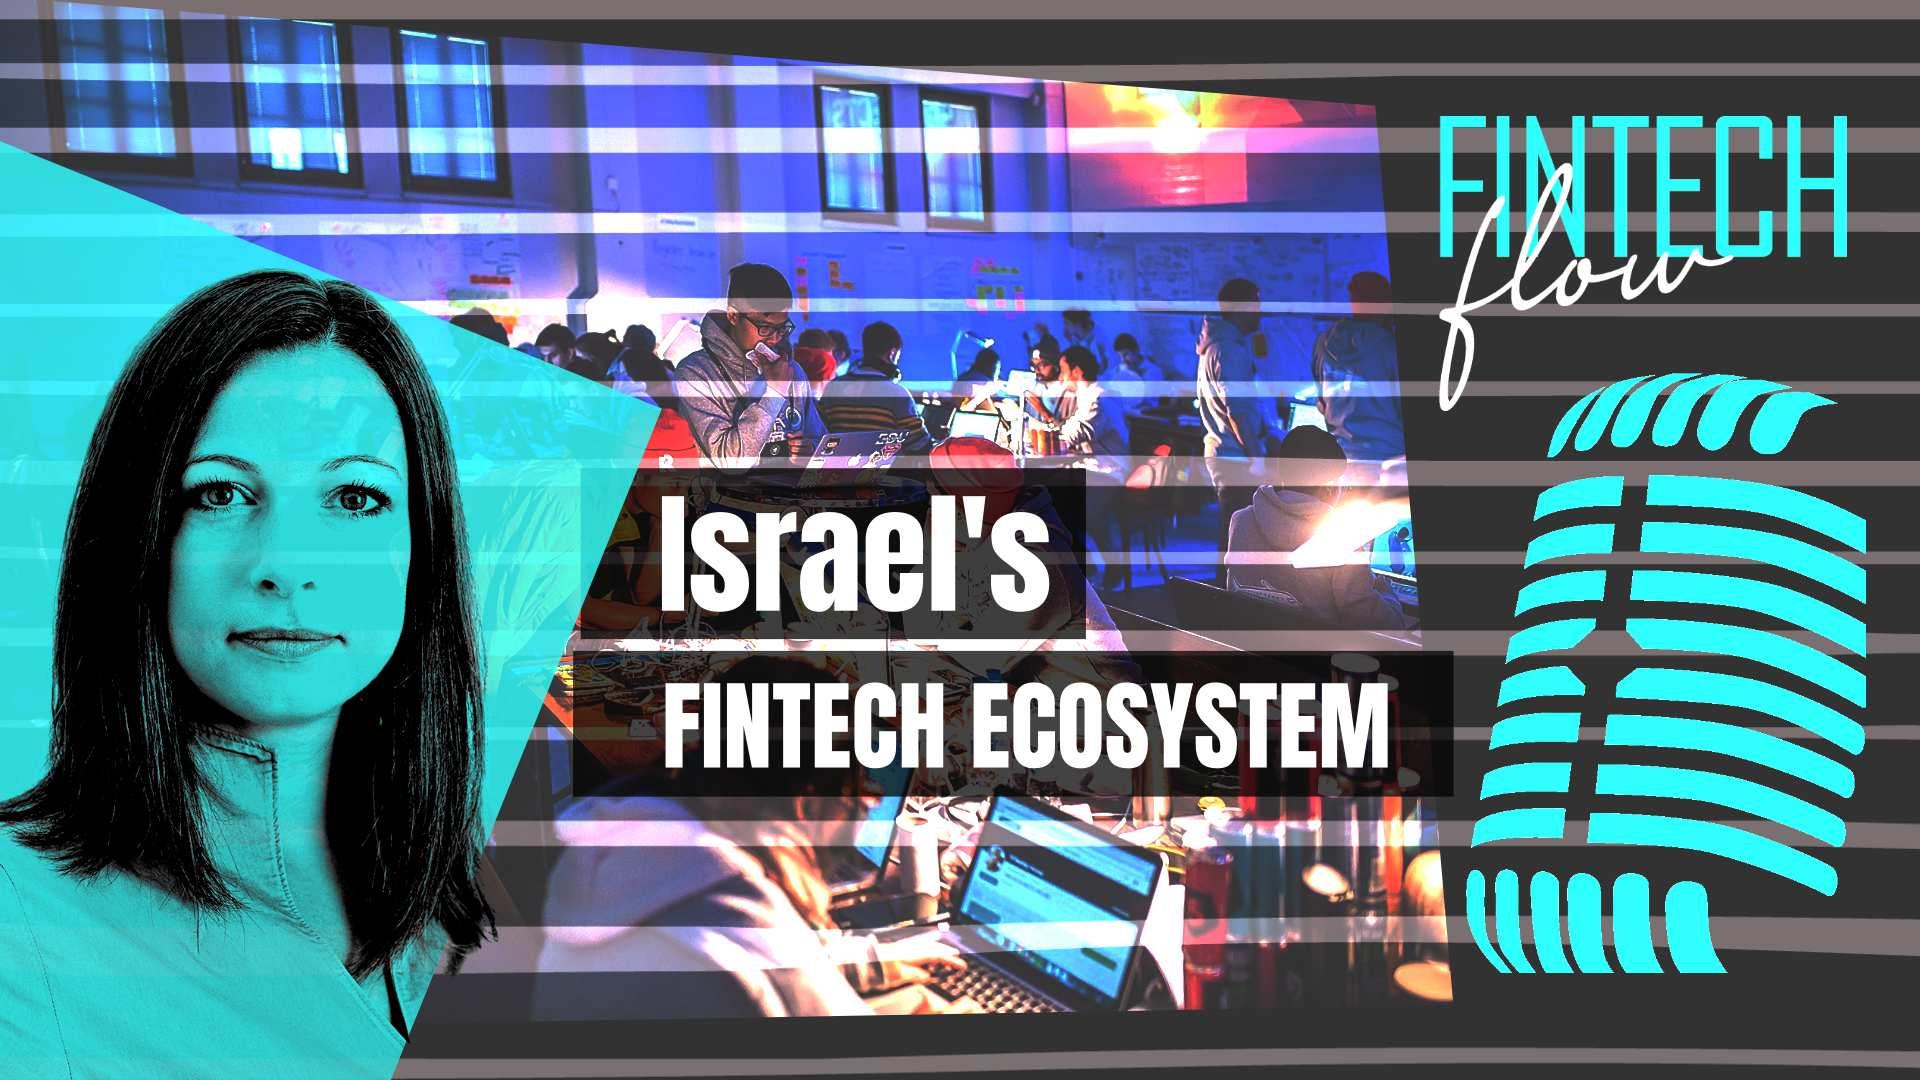 fintechflow-design-posdcast-5-israel-fintech